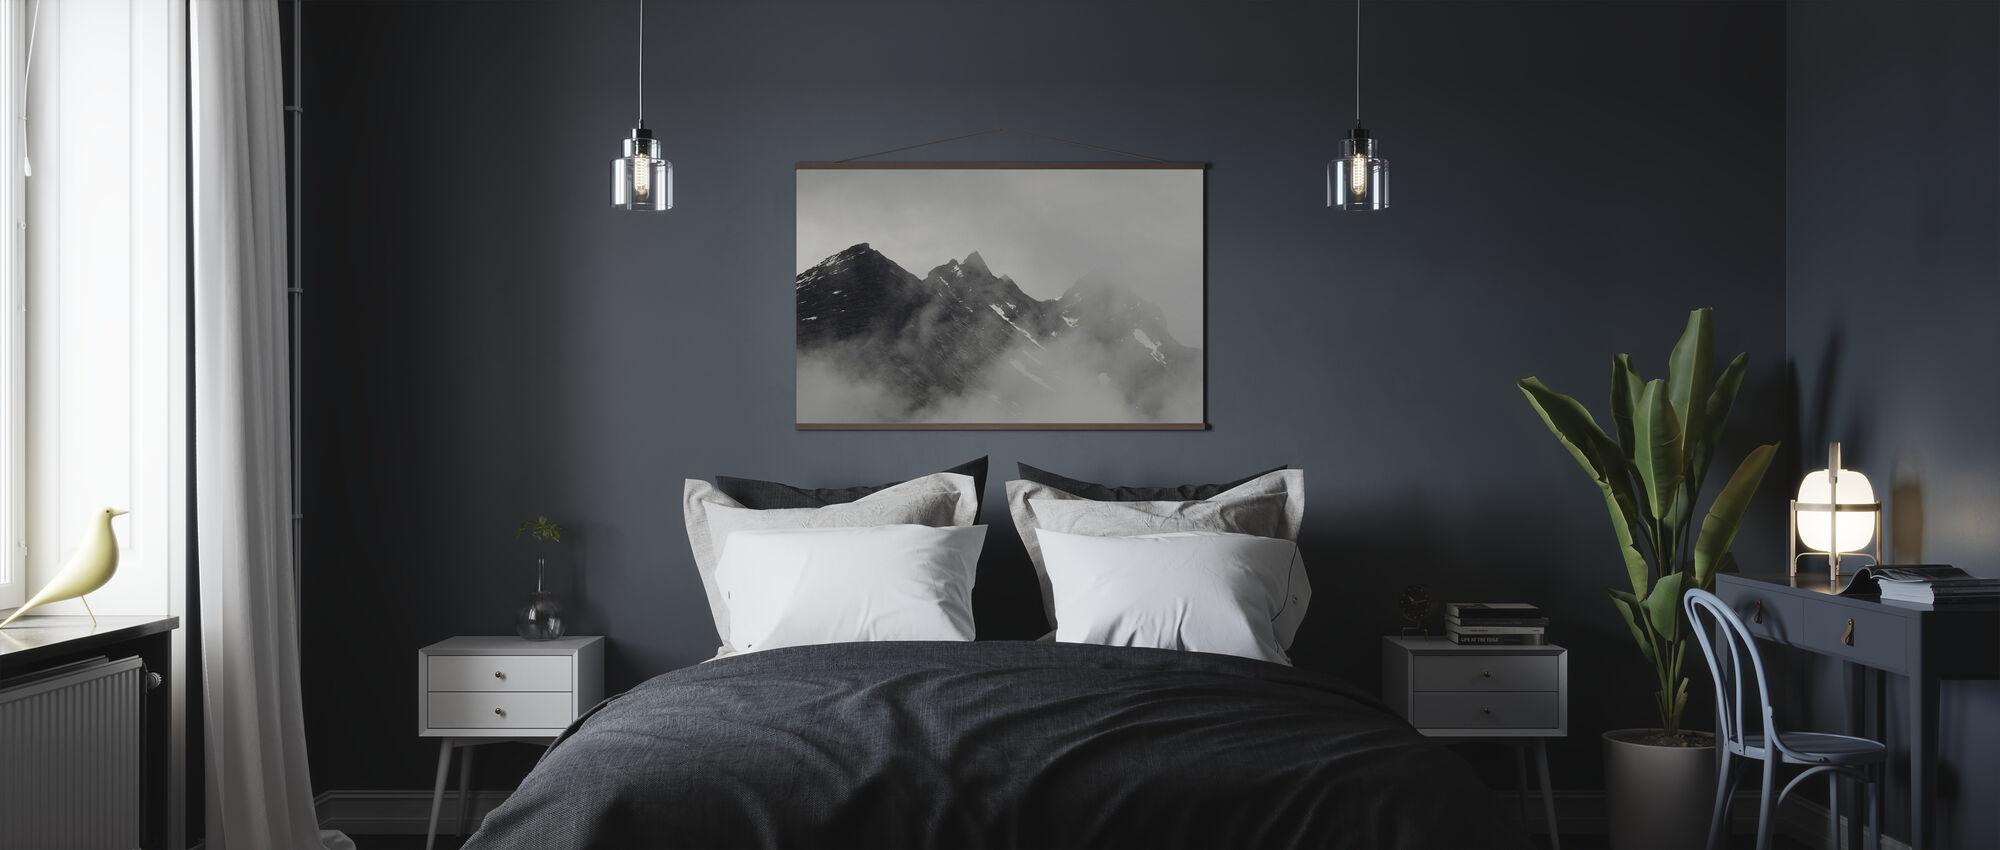 Vettisfossen-bjergene, Norge - Plakat - Soverom